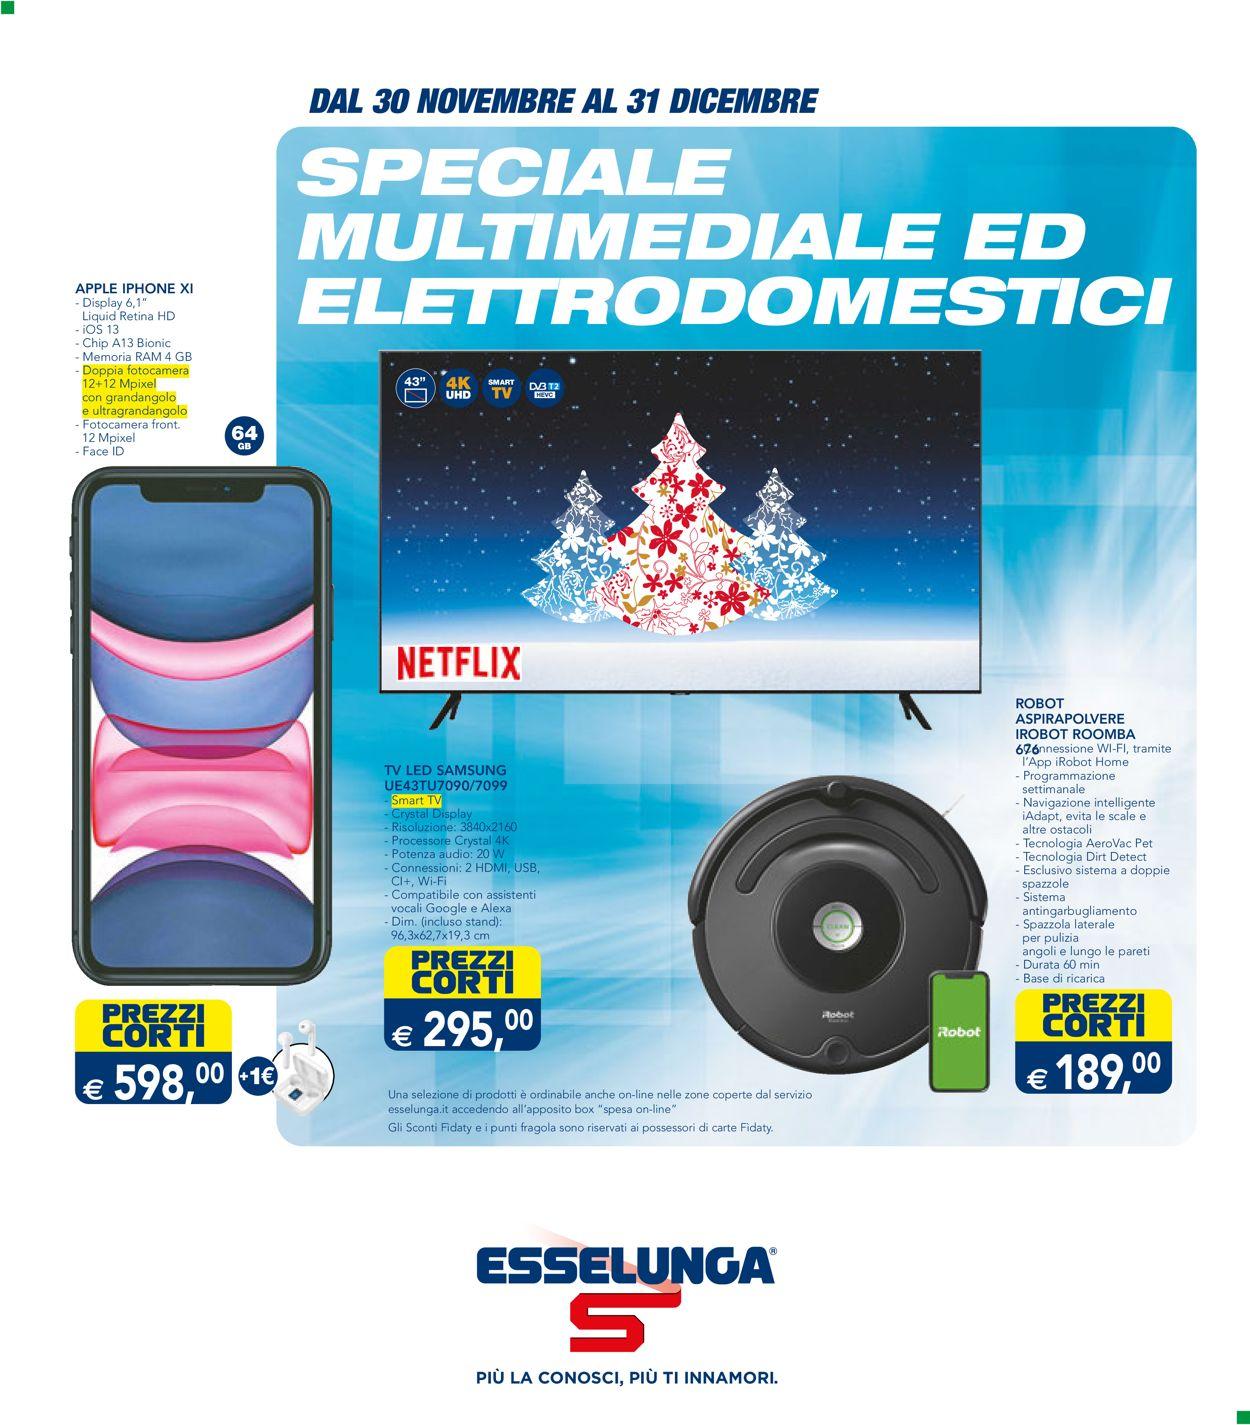 Volantino Esselunga - Natale 2020 - Offerte 30/11-31/12/2020